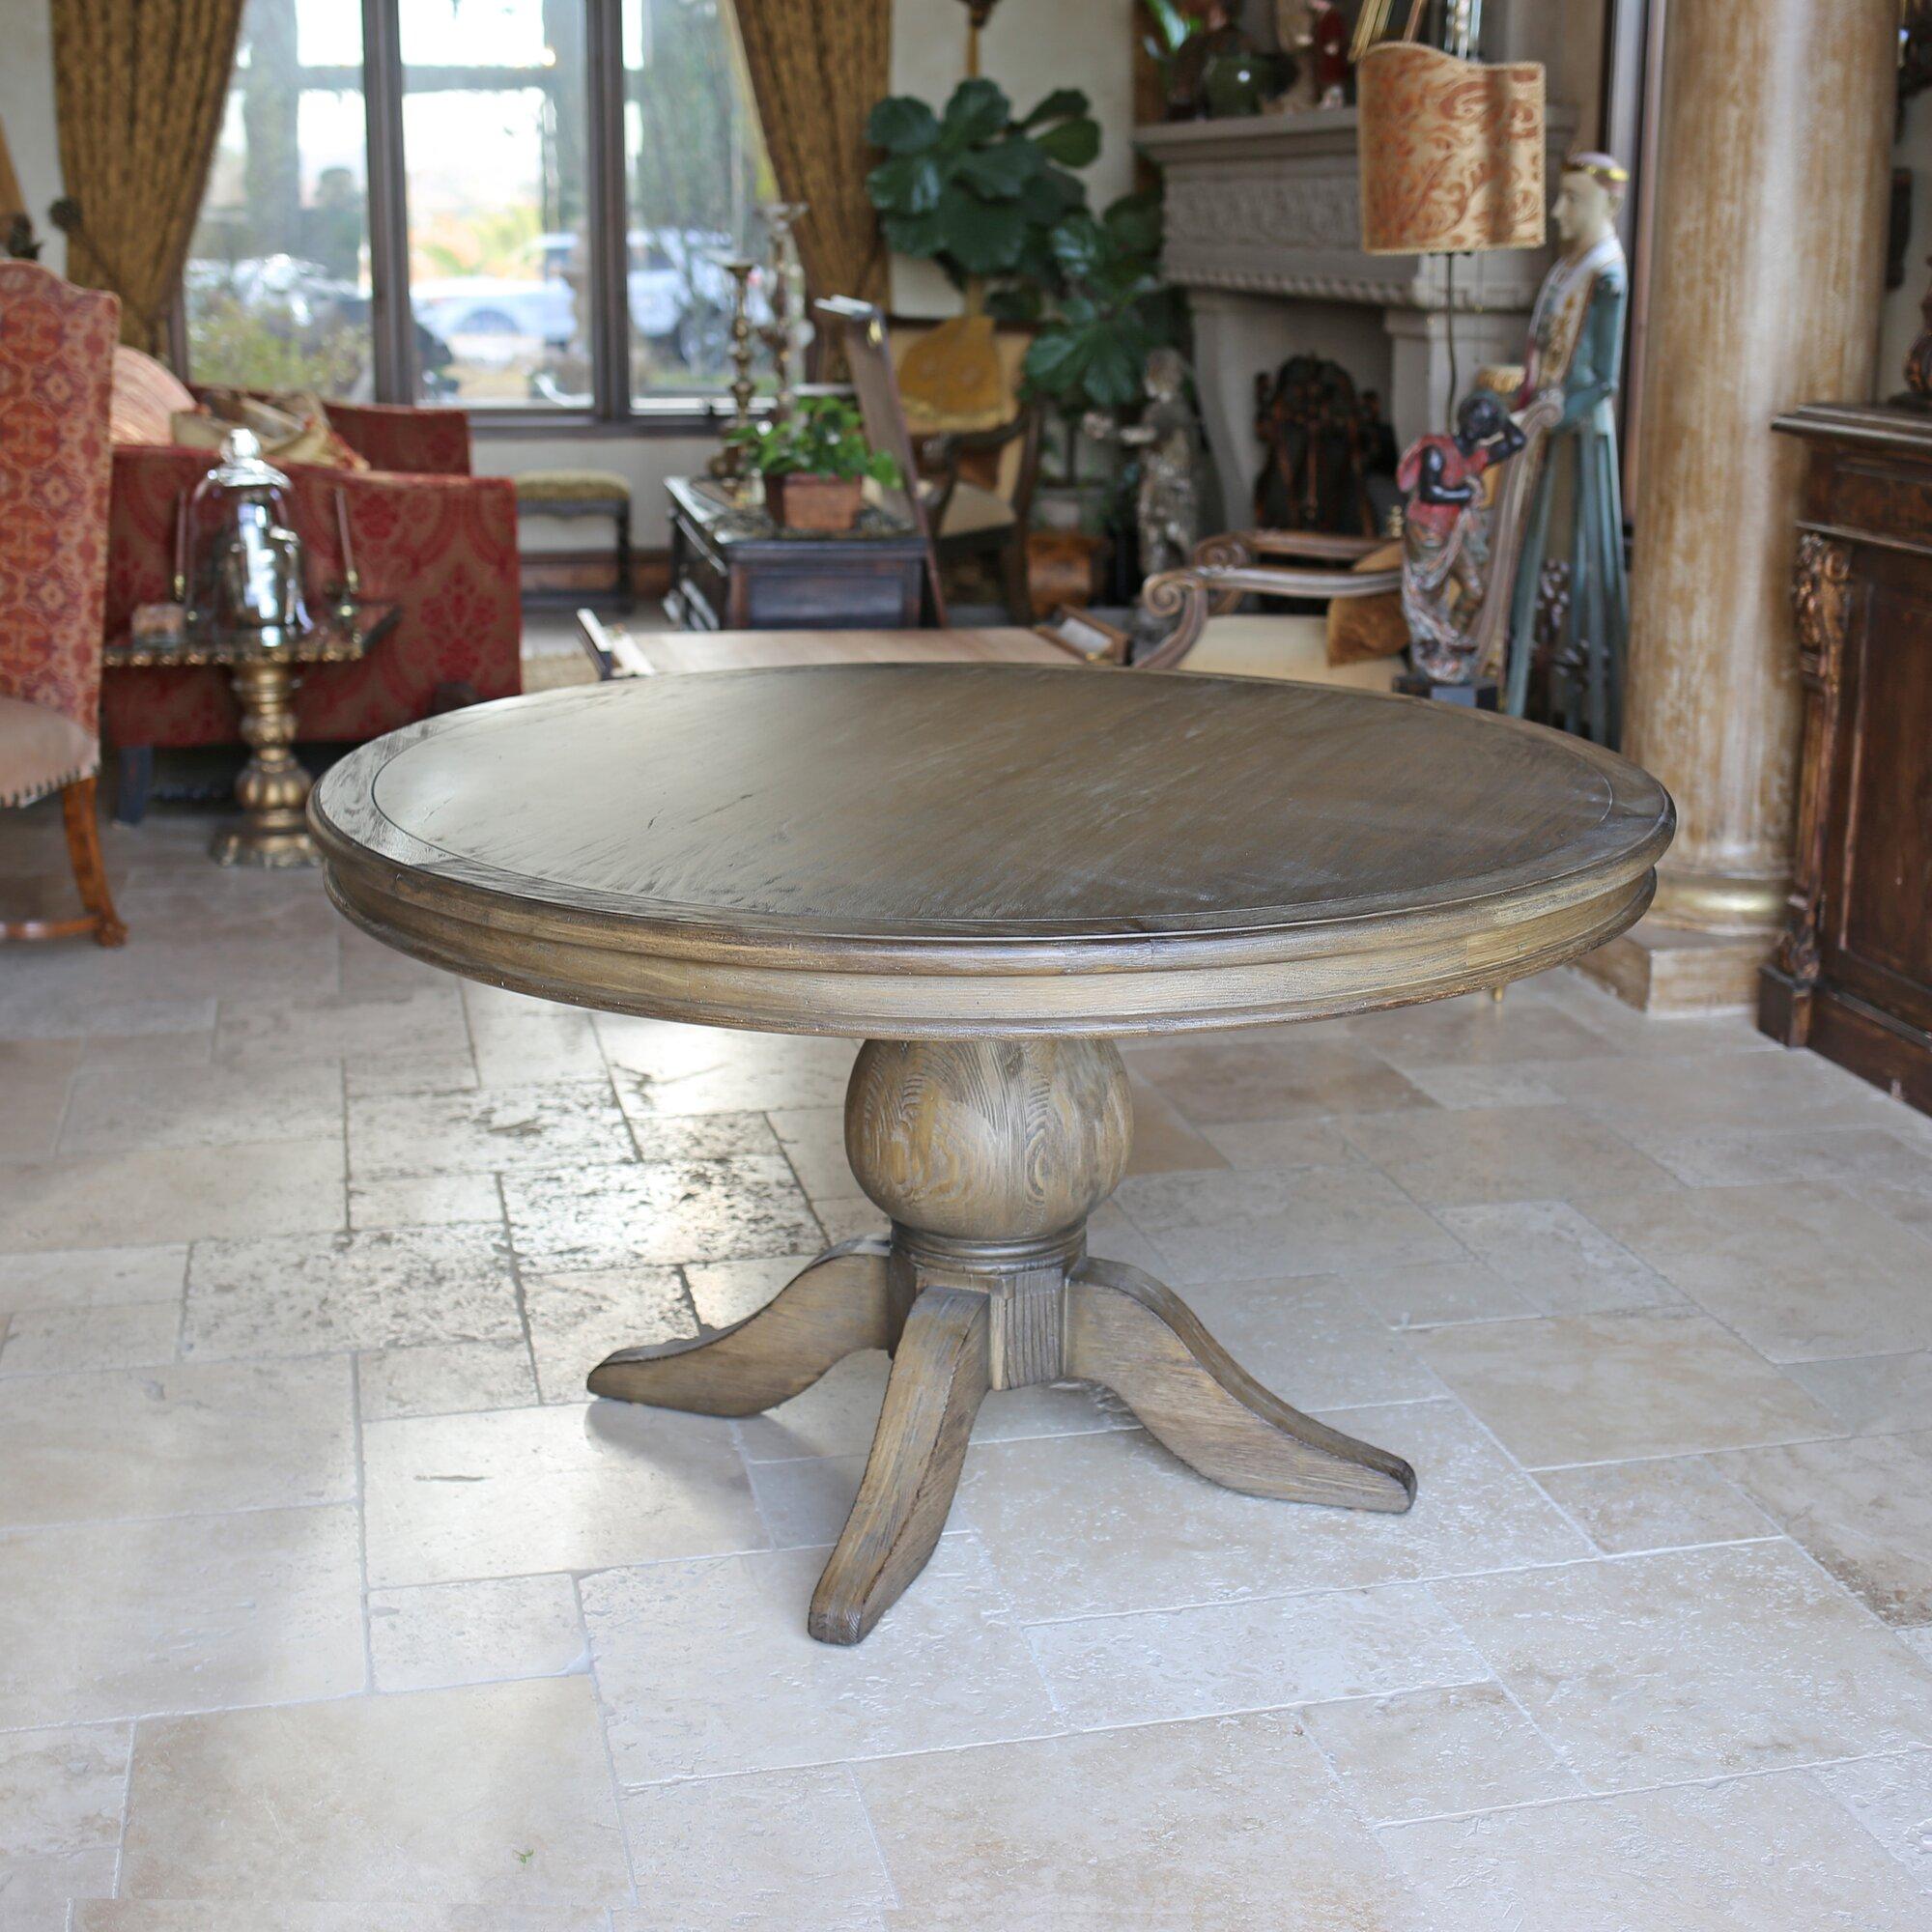 KovetHospitality Florence Reclaimed Wood Round Dining Table ...